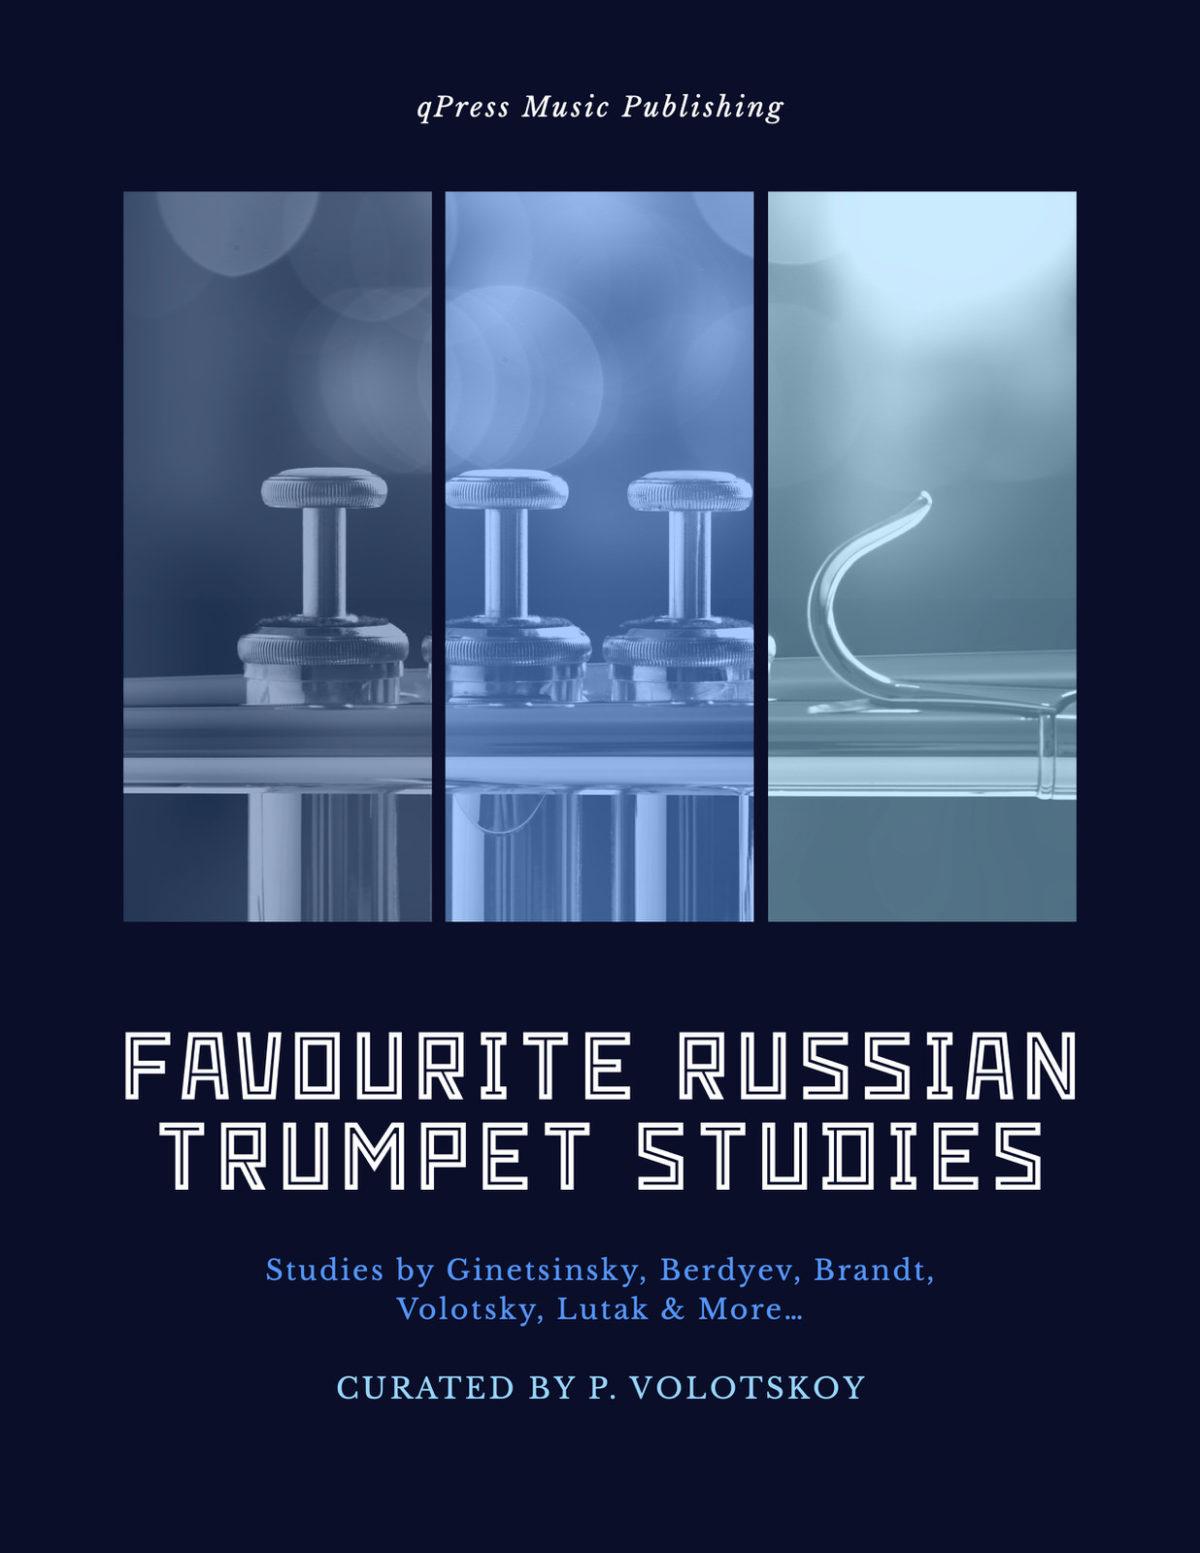 Volotskoy, Favourite Russian Studies for Trumpet